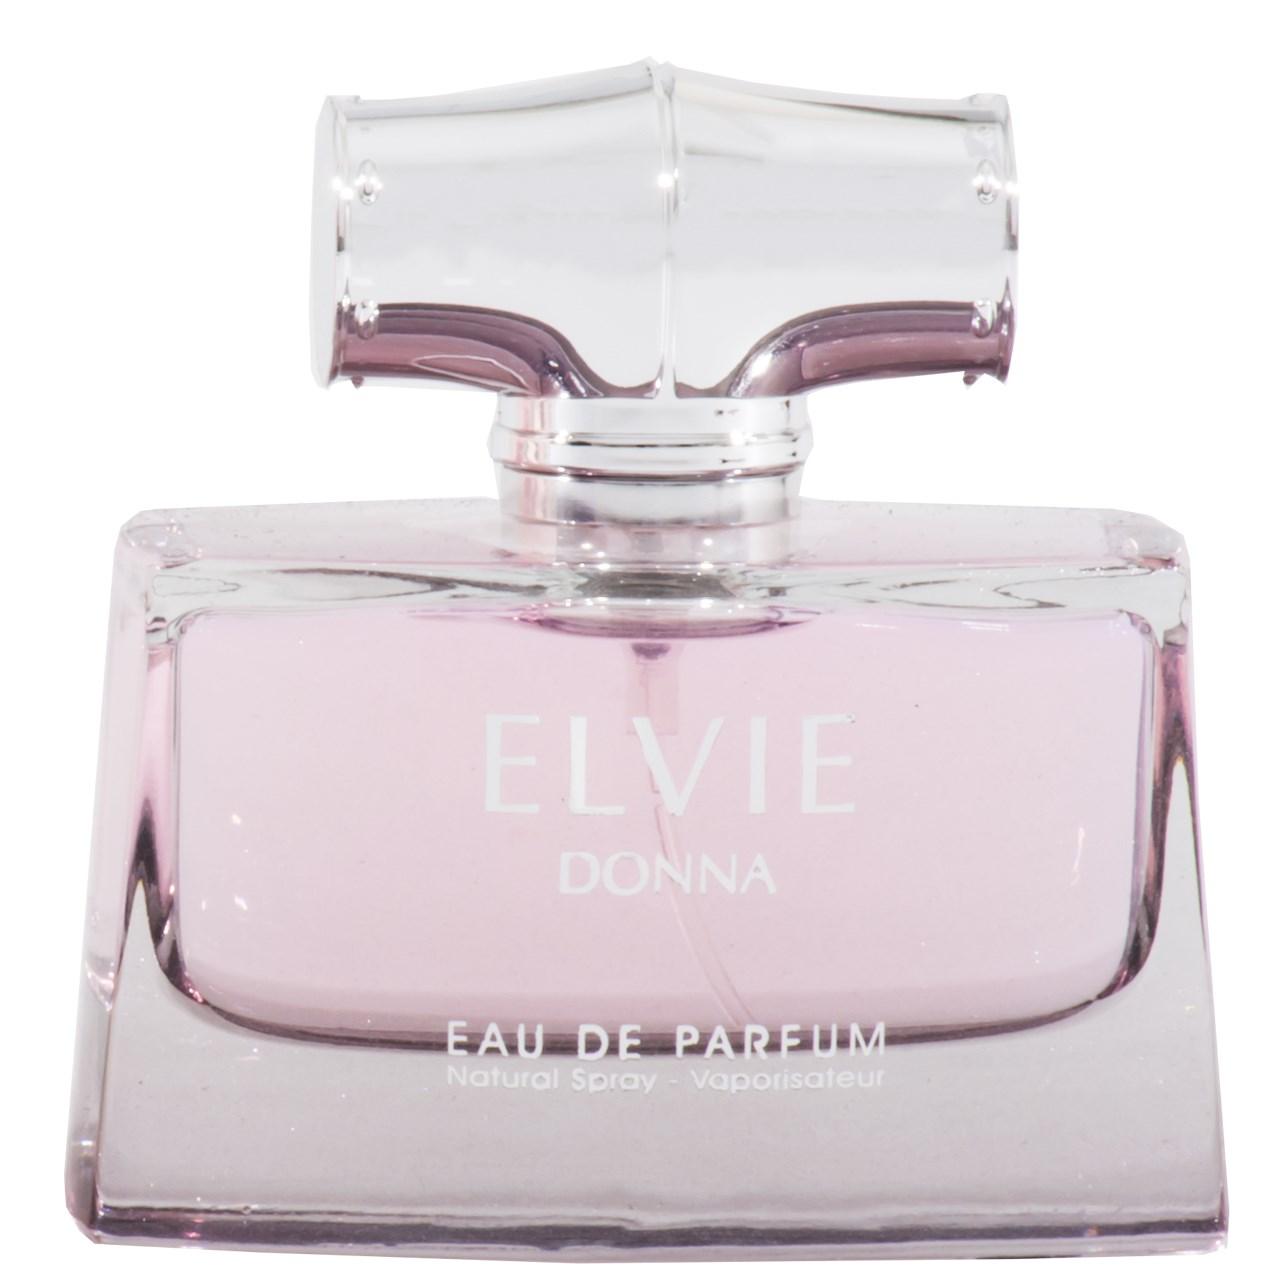 ادو پرفیوم زنانه فراگرنس ورد مدل Elvie Donna حجم 100 میلی لیتر